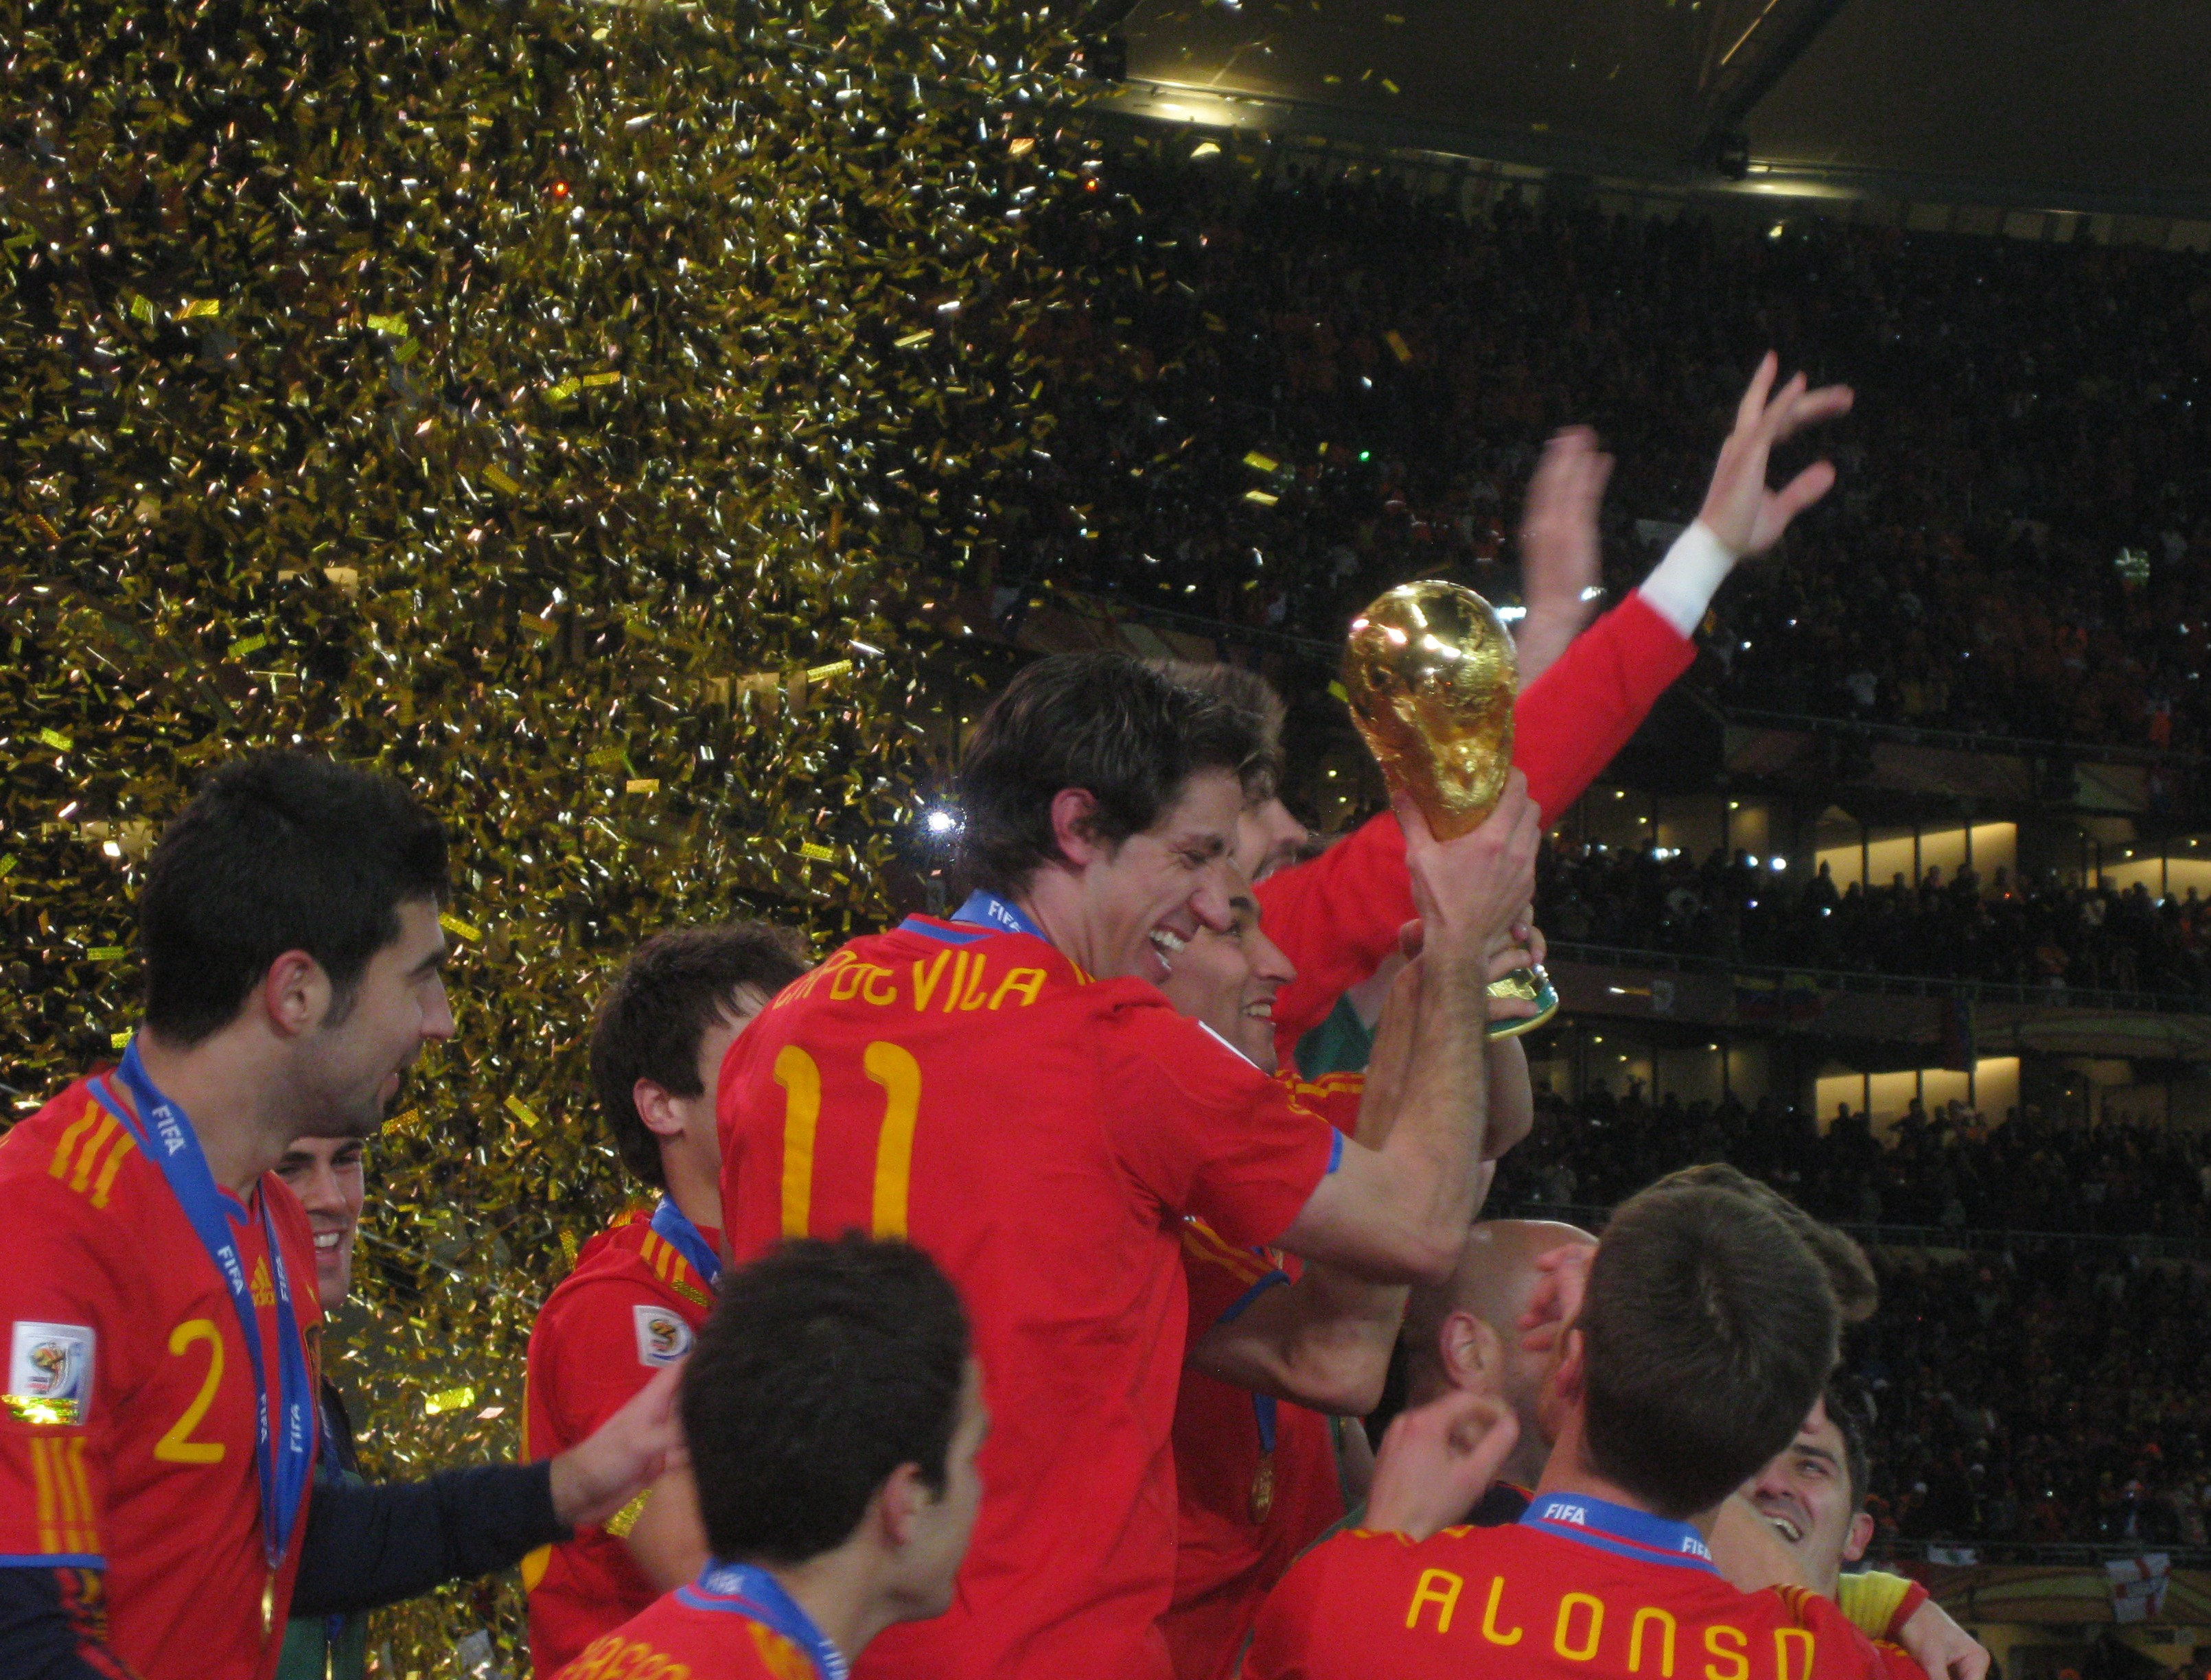 Espanha comemora o título de 2010 (Foto: Wikimedia Commons)